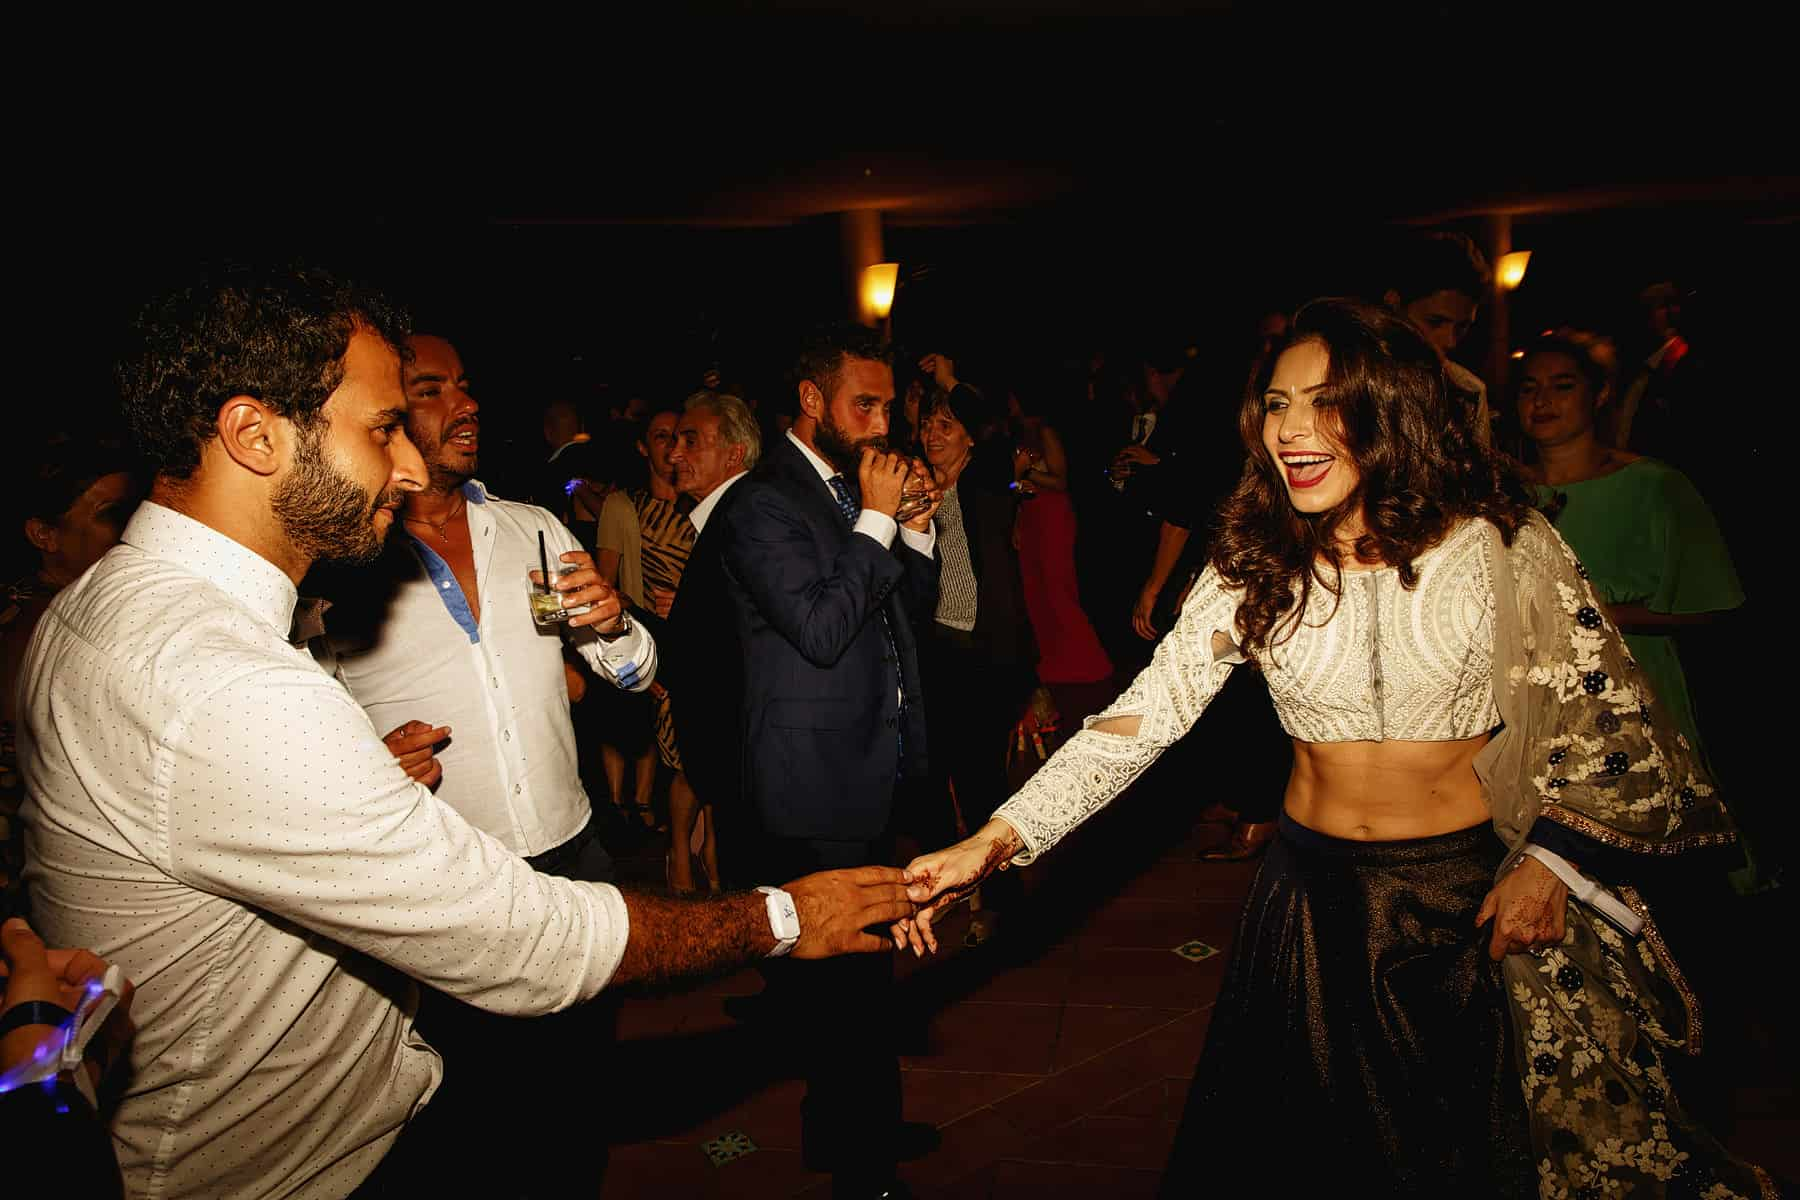 paestum italy weddings hindu